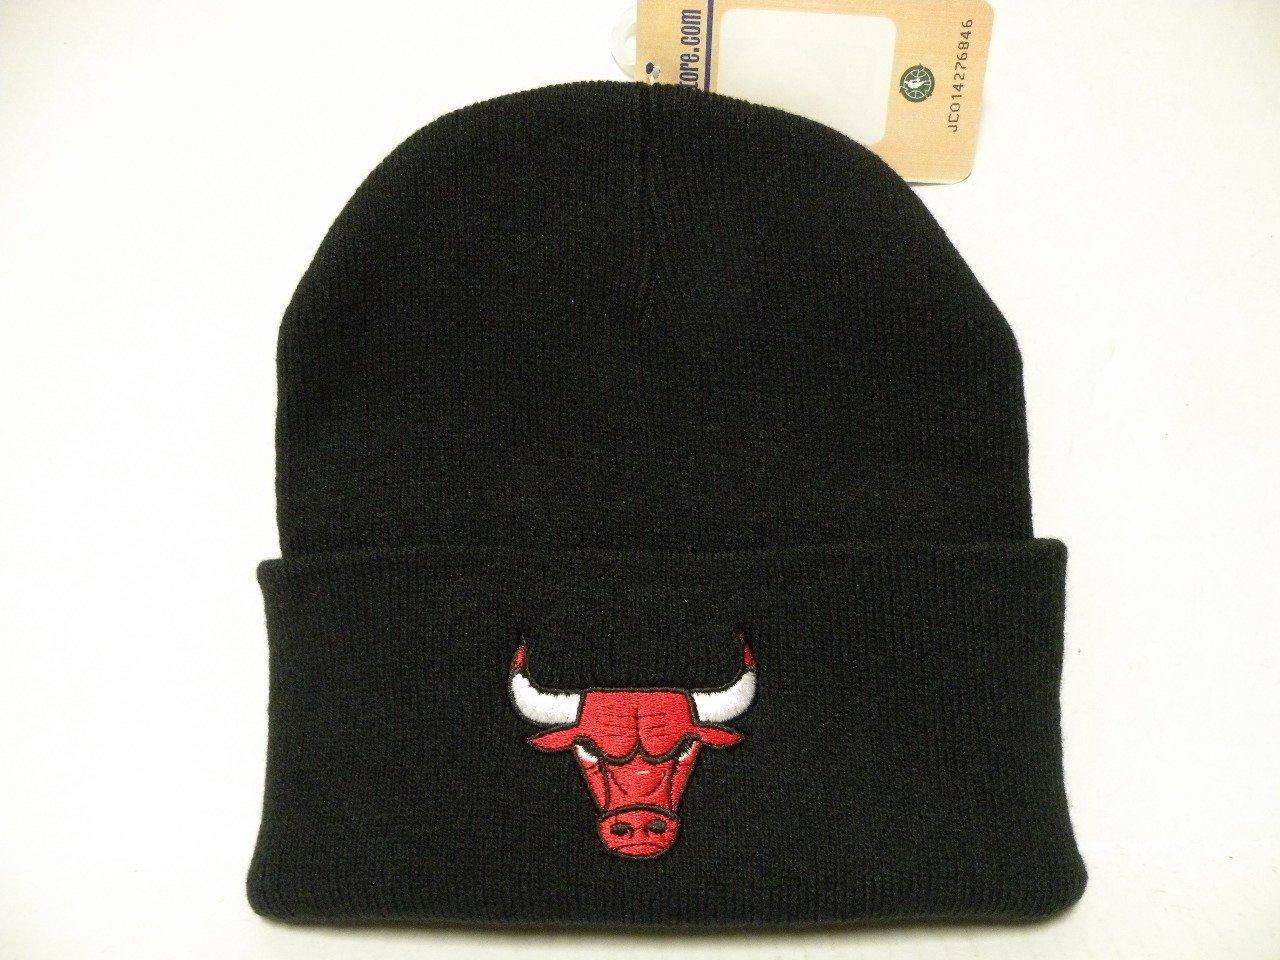 eb758db89326e3 Get Quotations · Authentic NBA Chicago Bulls Logo Team Black Cuffed Retro  Knit Beanie Cap